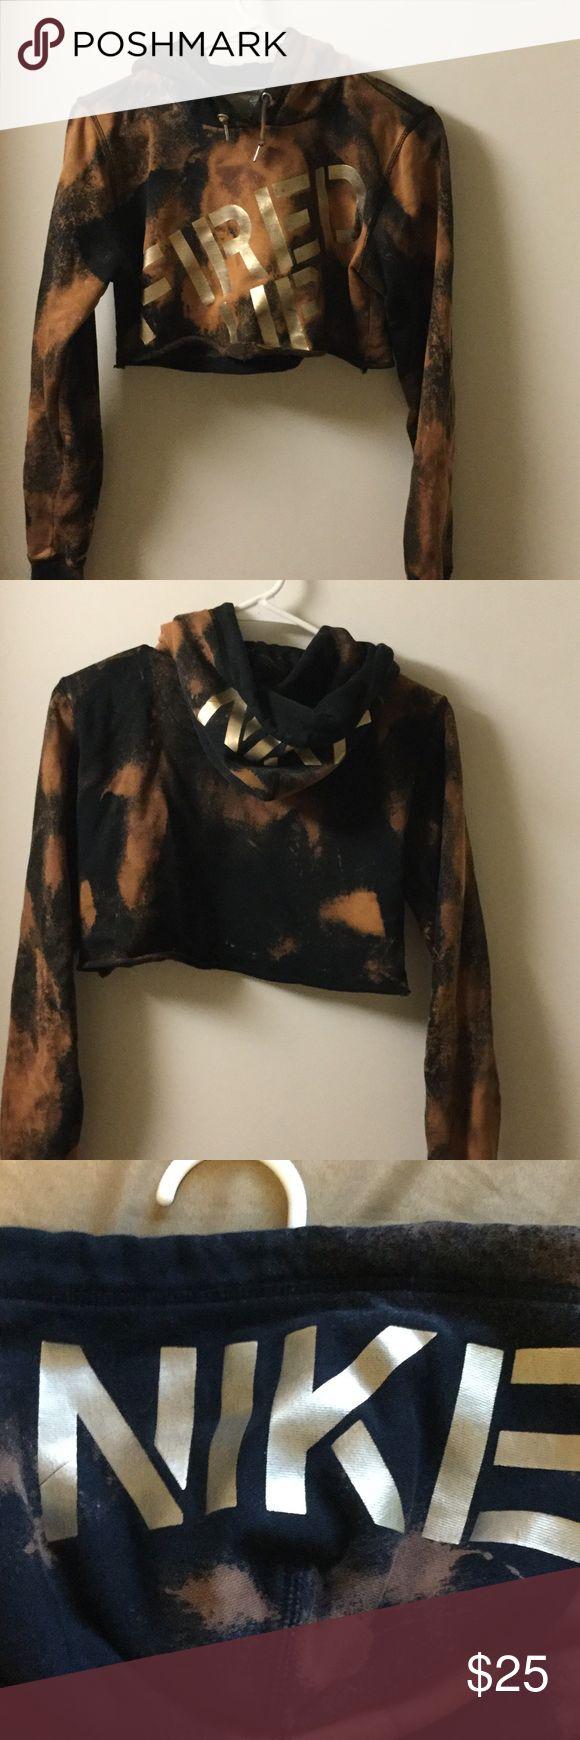 Nike custom crop top hoodie I cut and bleached this hoodie myself. Nike and a size medium Nike Sweaters Crew & Scoop Necks